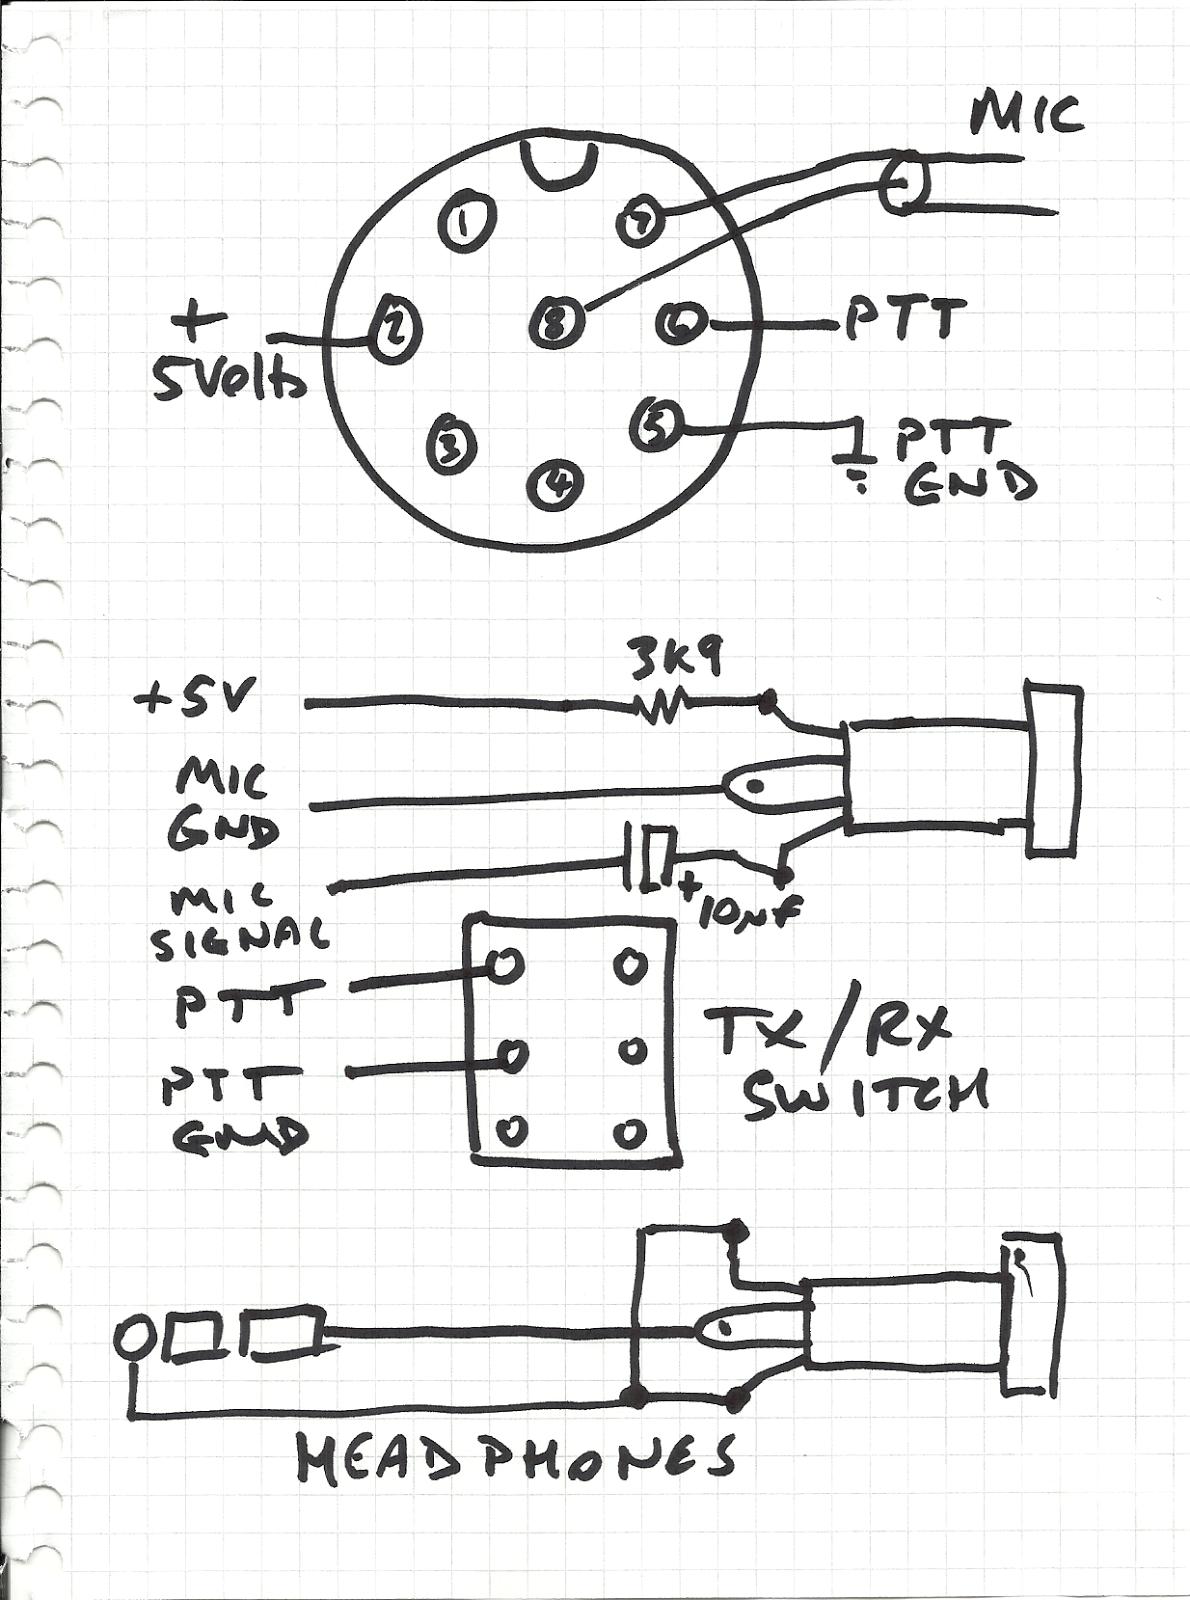 Motorola Speaker Mic Wiring Diagrams - Select Stat Swamp Cooler Wiring  Diagram - usb-cable.pontiacs.jeanjaures37.fr | Motorola Speaker Mic Wiring Diagrams |  | Wiring Diagram Resource